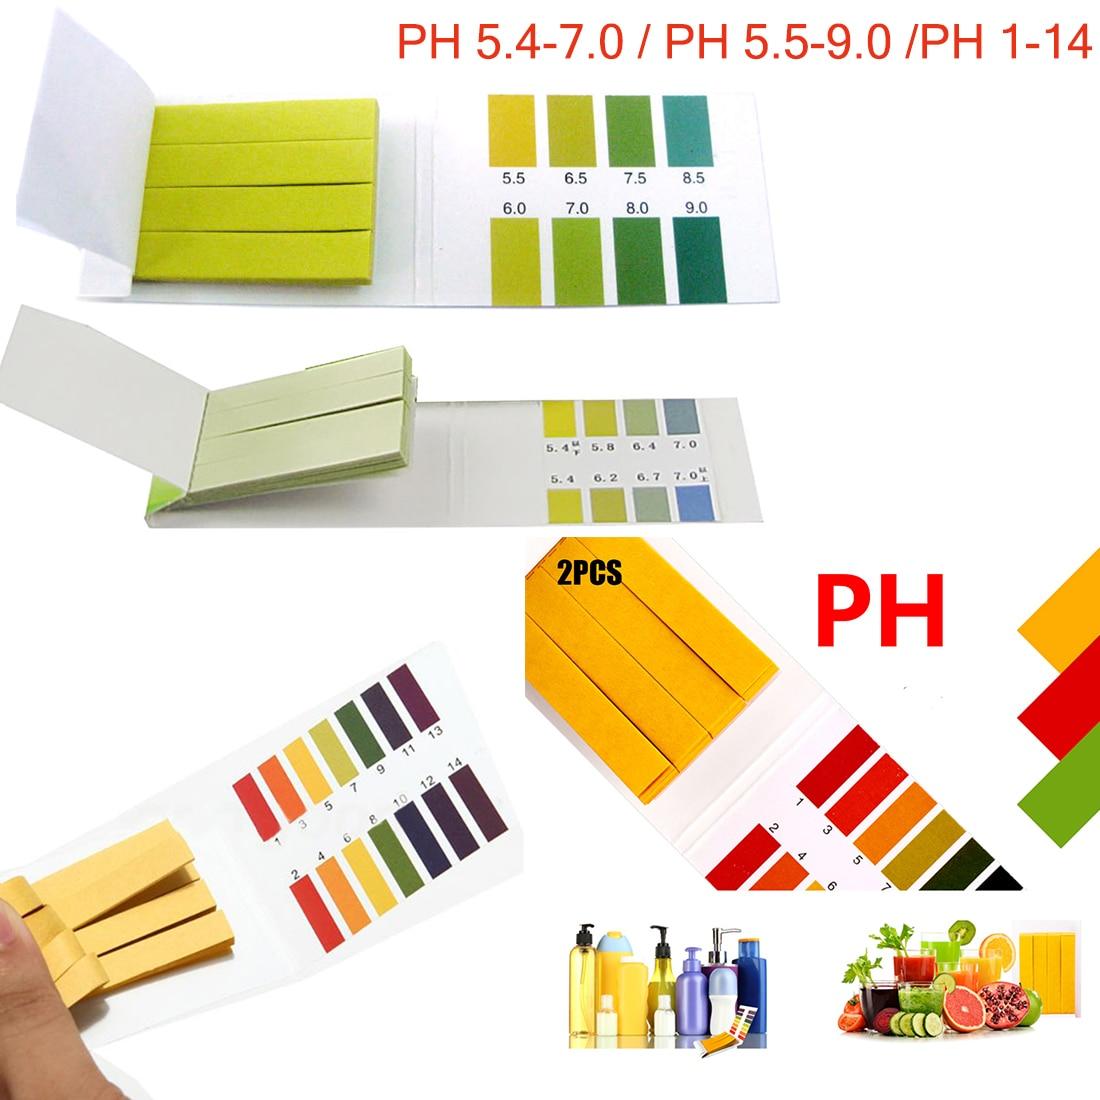 PH 5.4-7.0,PH 5.5-9.0,PH 1 -14  Alkaline Test Papers Strips Indicator Lab Supplies Litmus Testing Kit For Plant,Water 80 Strips